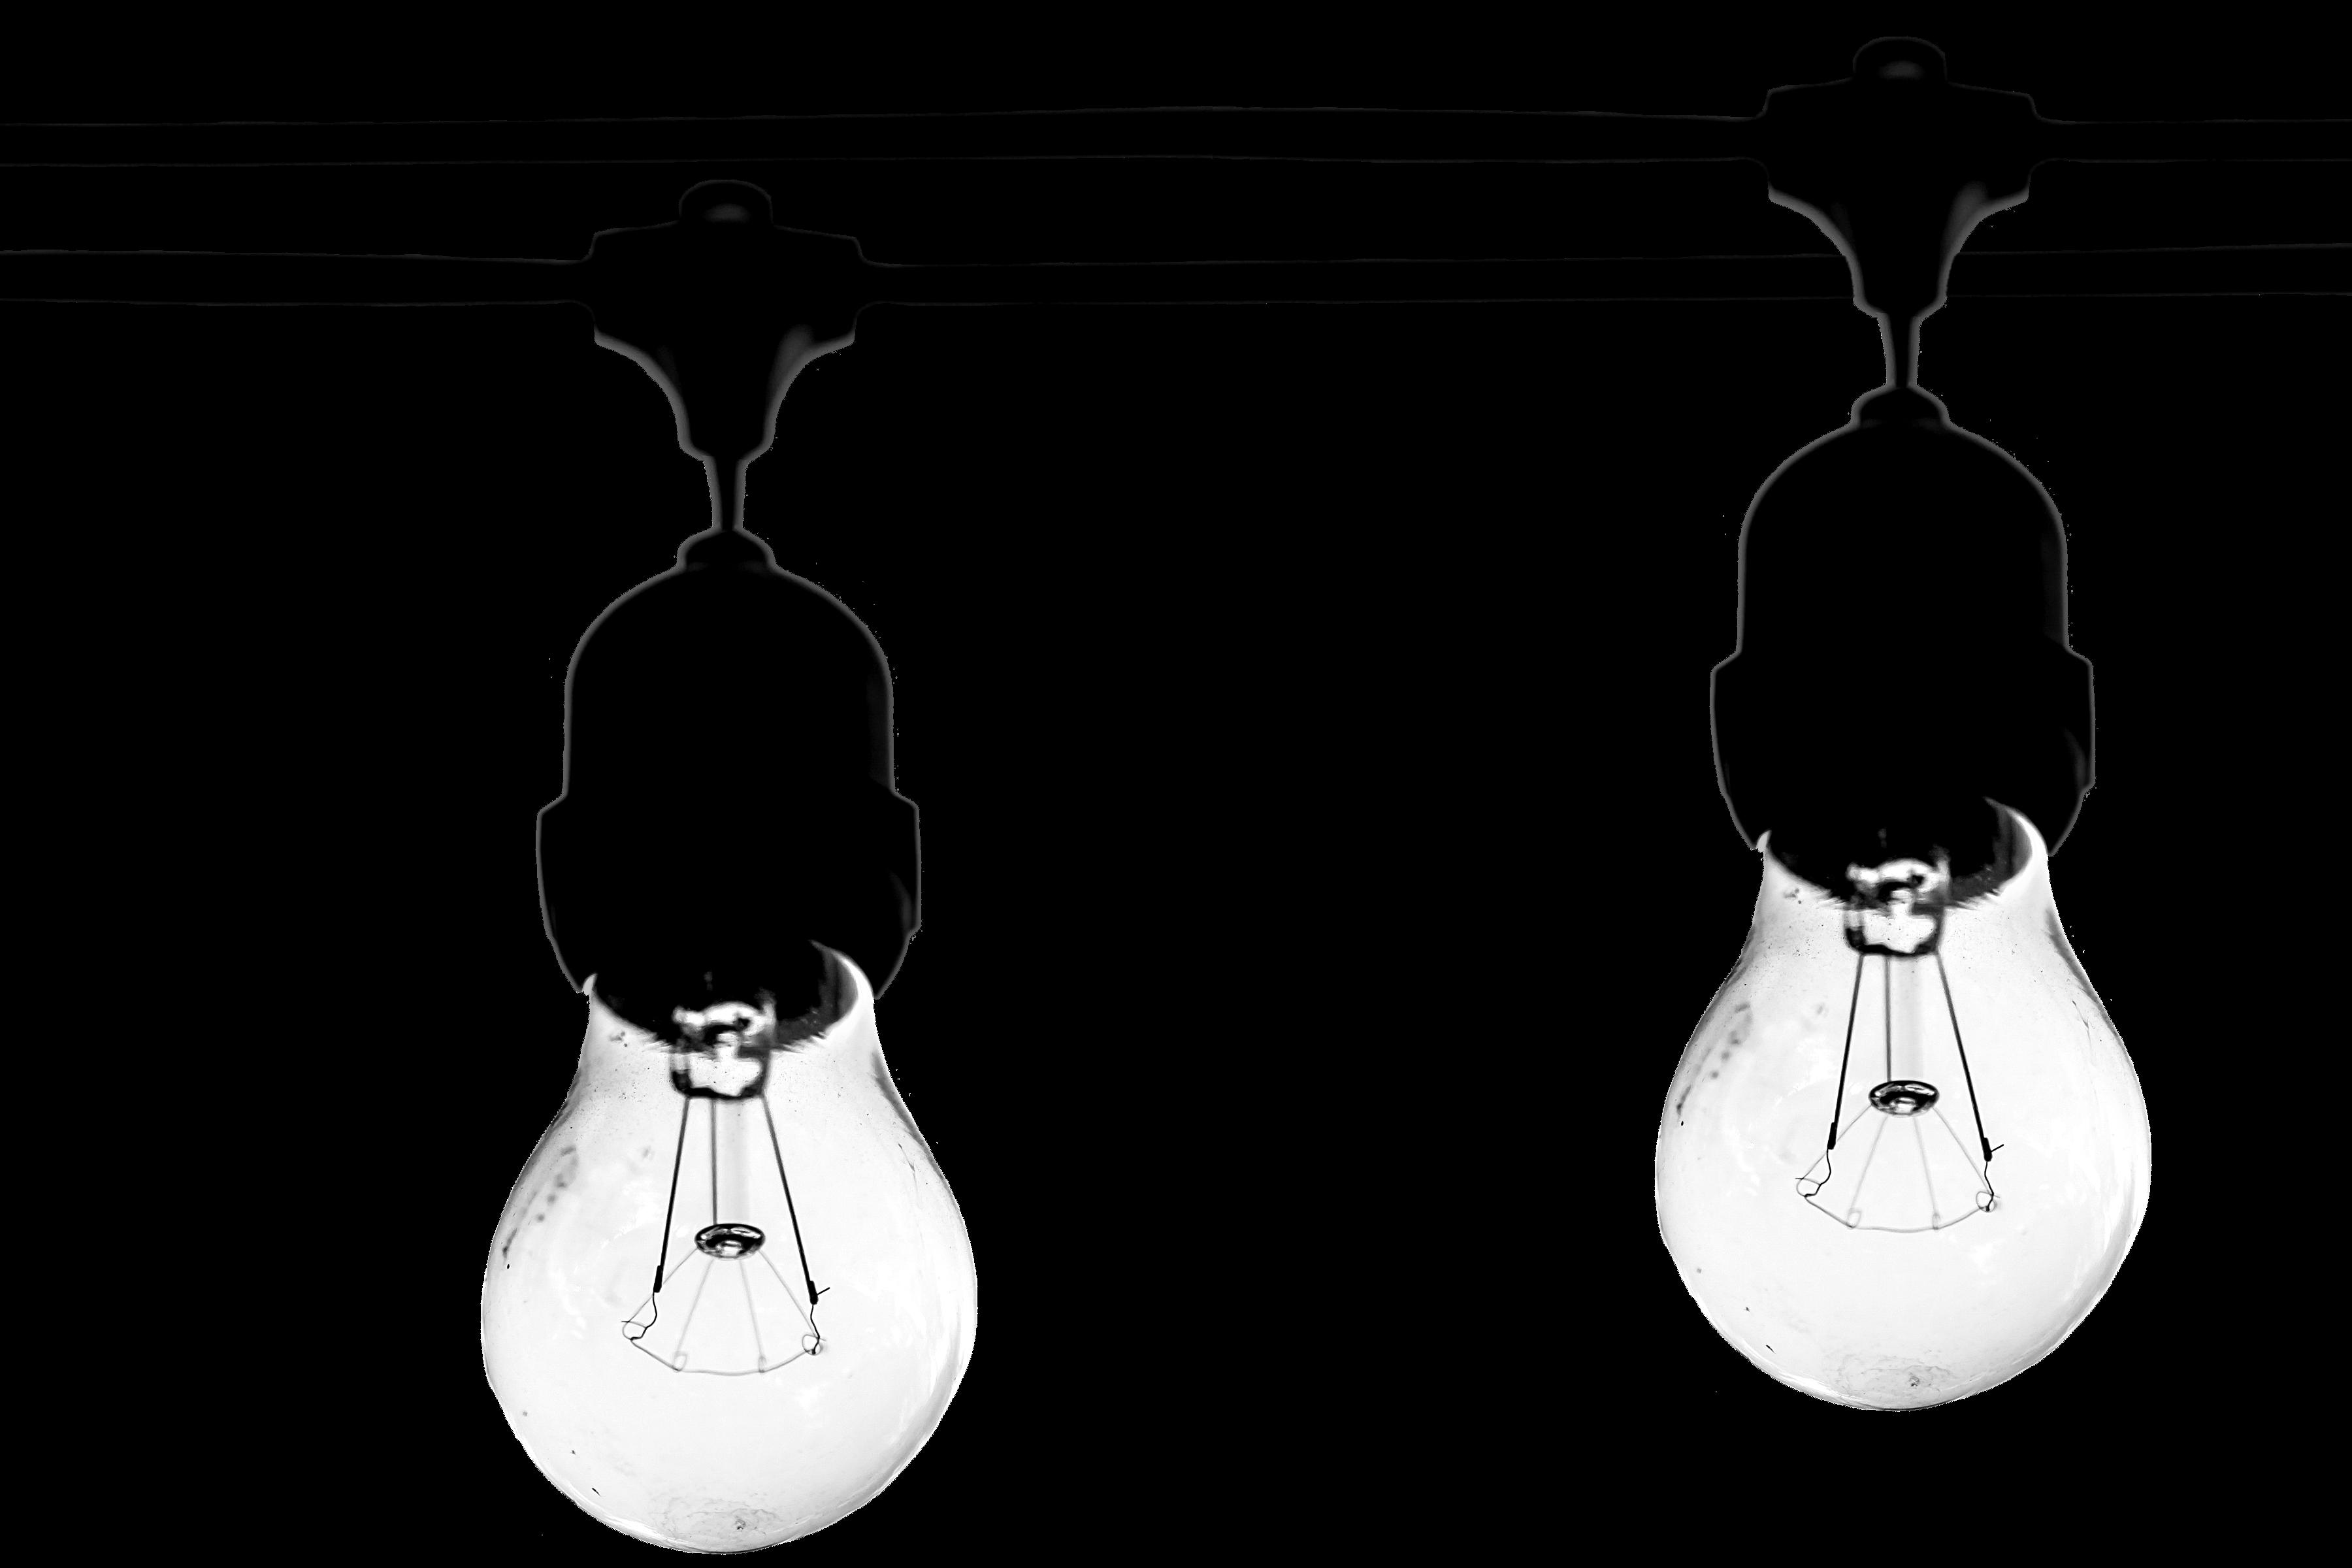 3600x2400 Free Stock Photo Of Art, Black And White, Bulb